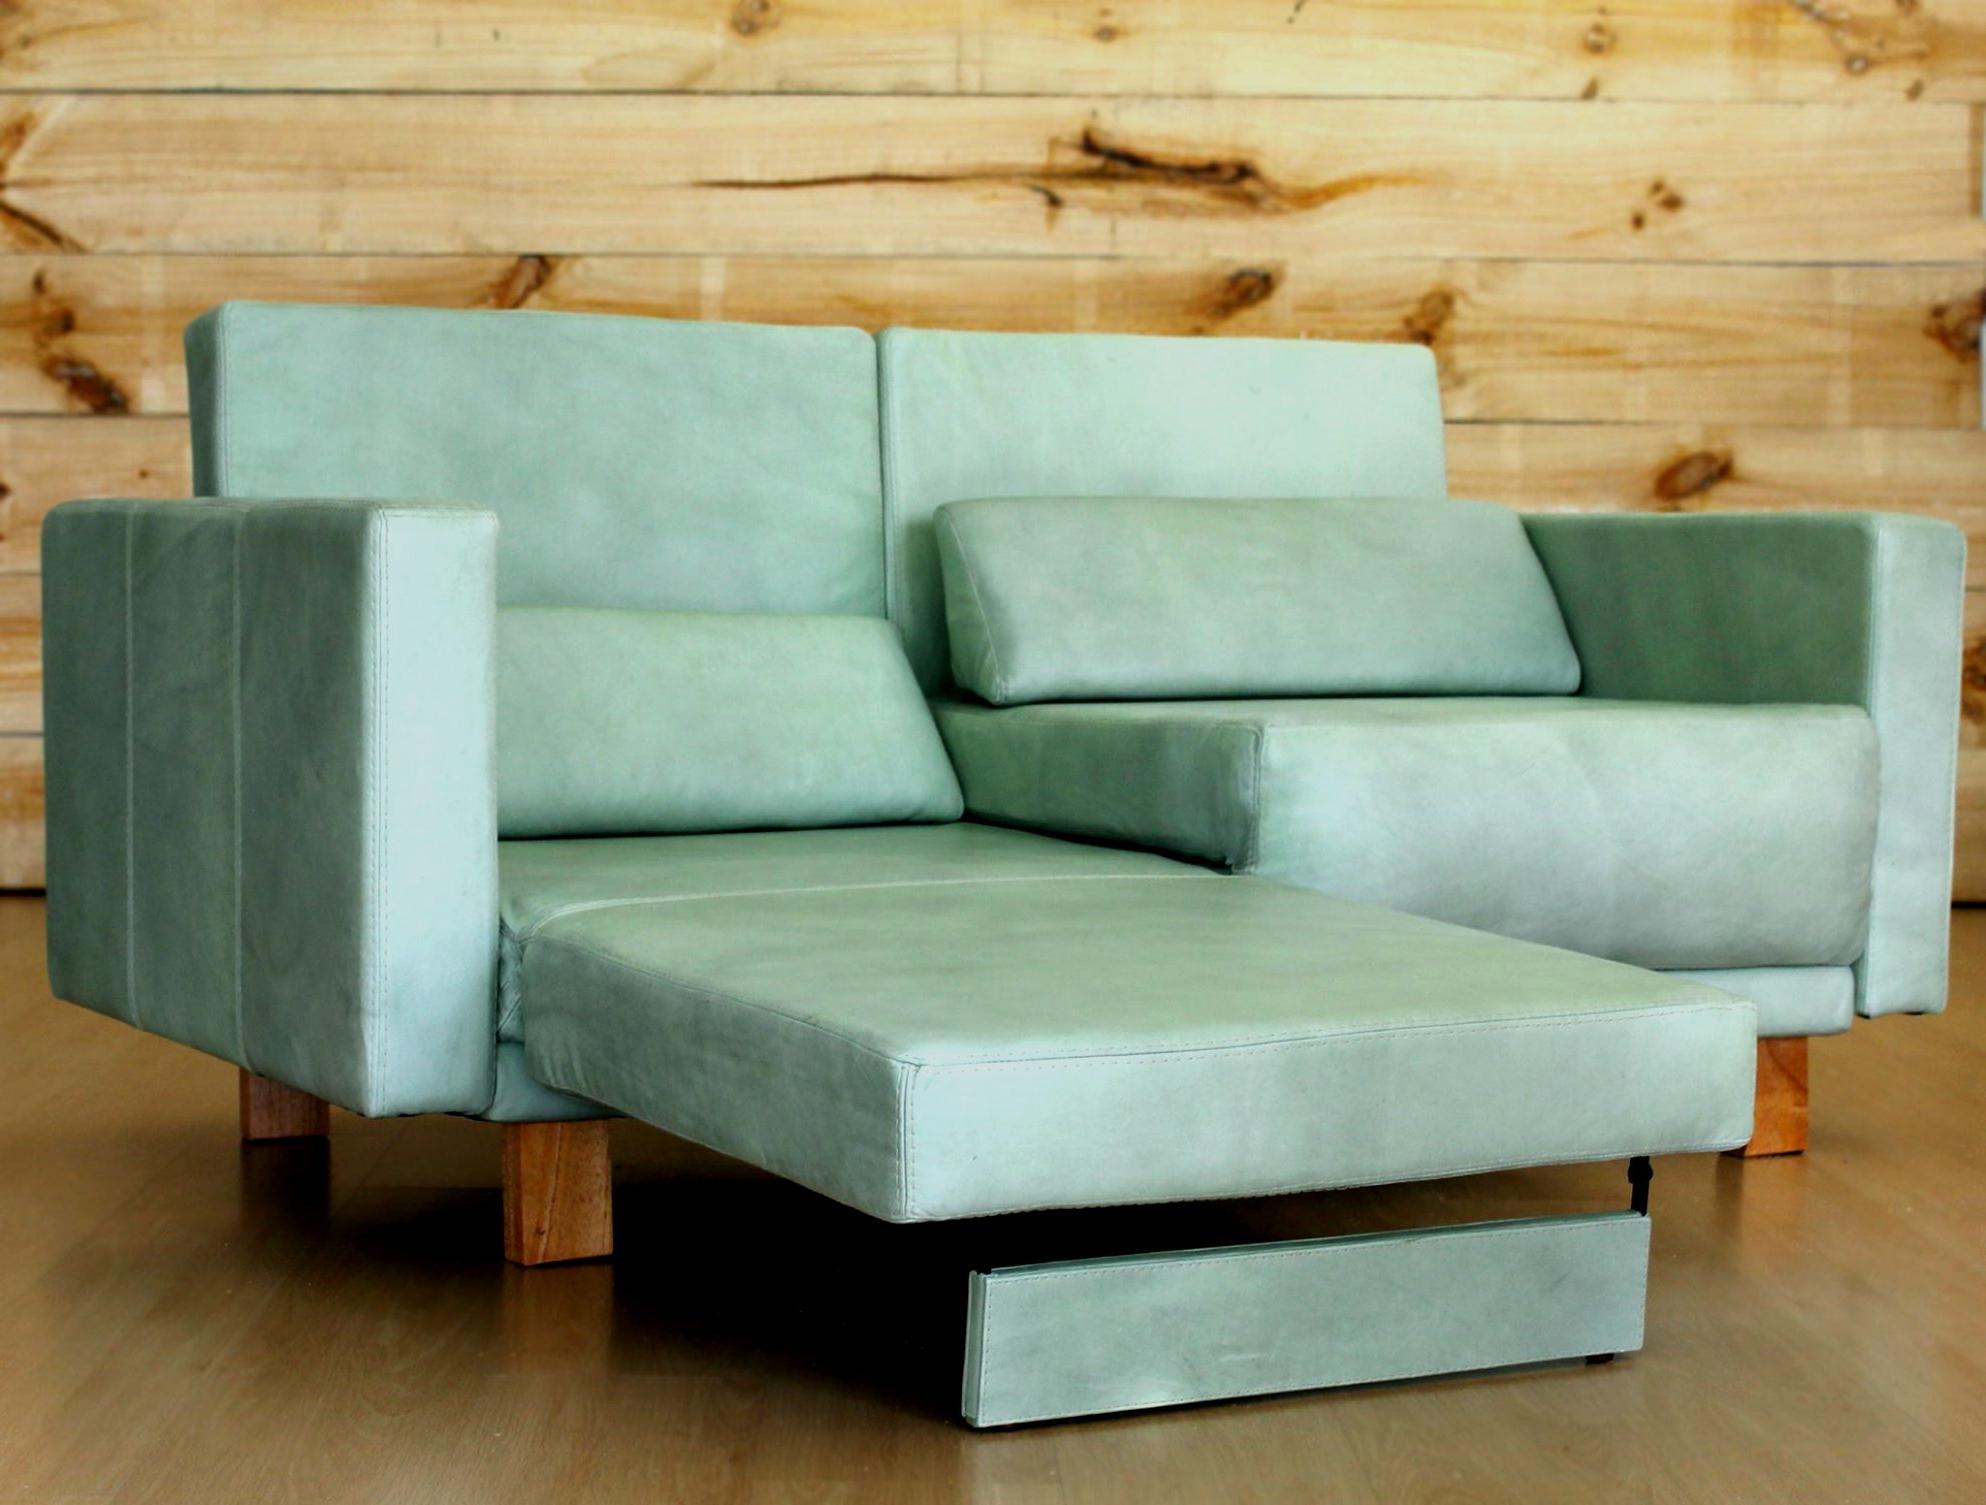 Kibuc sofas Cama Tldn Kibuc sofas Cama Agradable Medidas sofa 3 Plazas Inspirador Kibuc